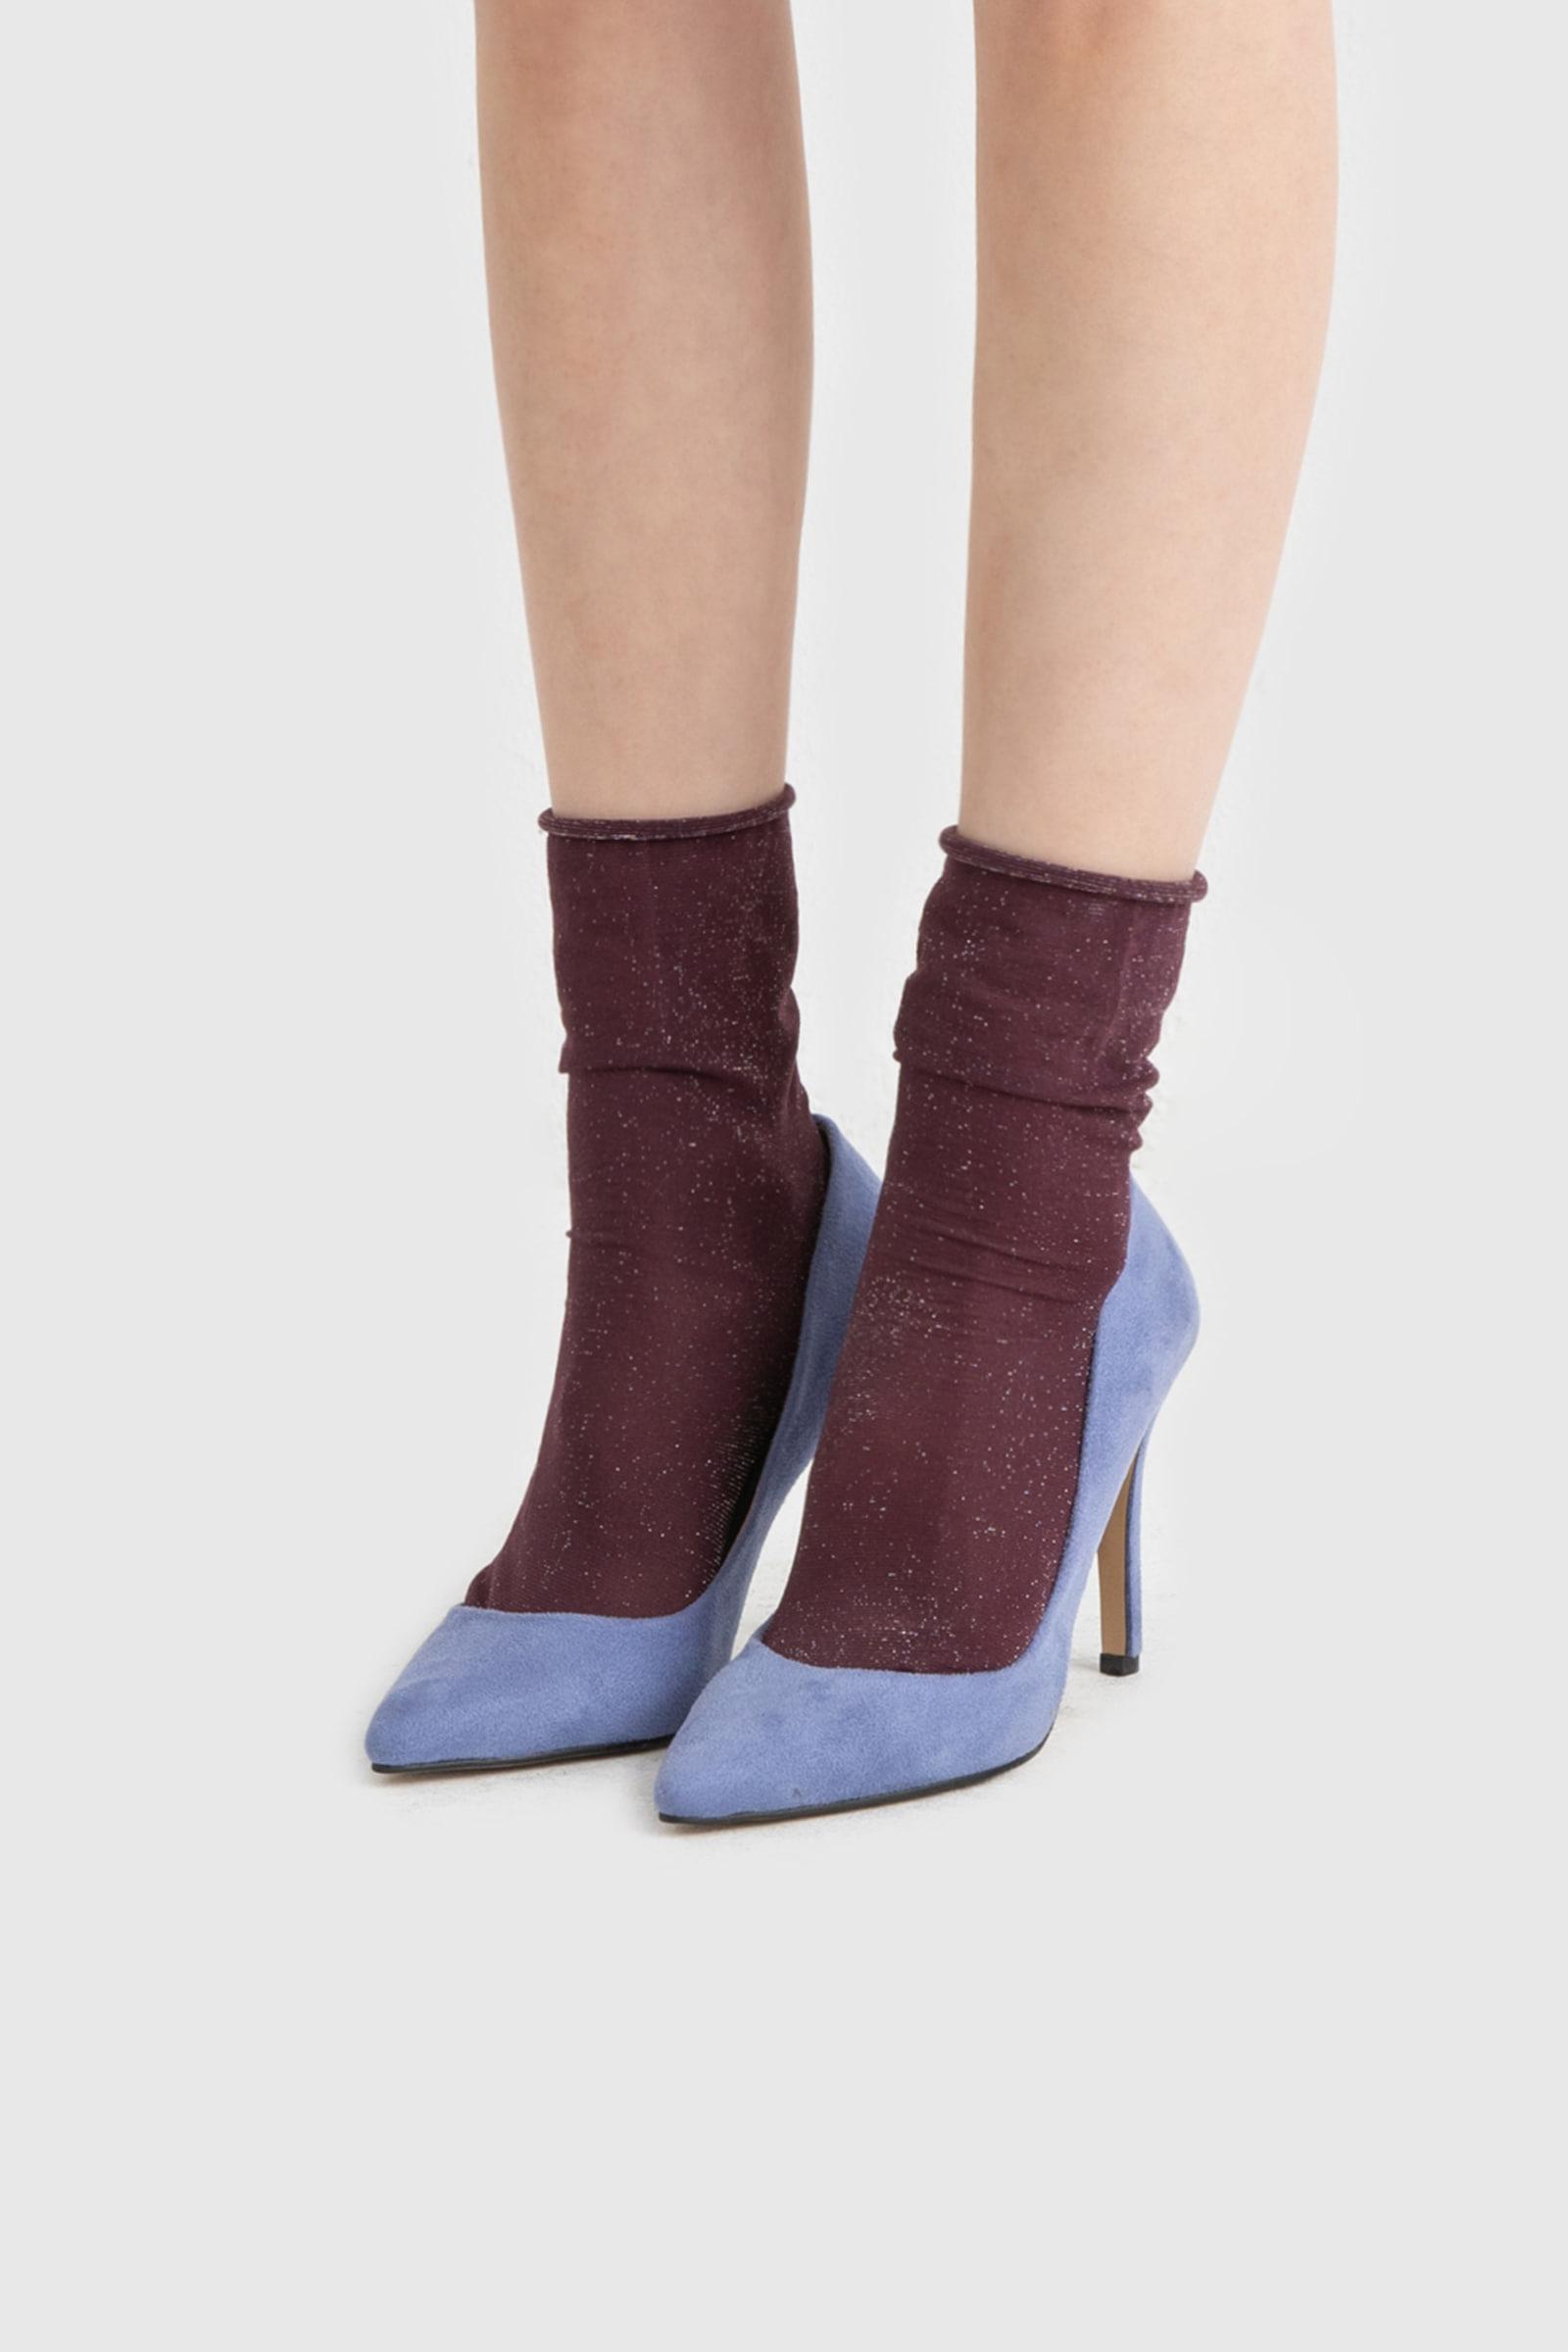 Party color stiletto high heel pumps